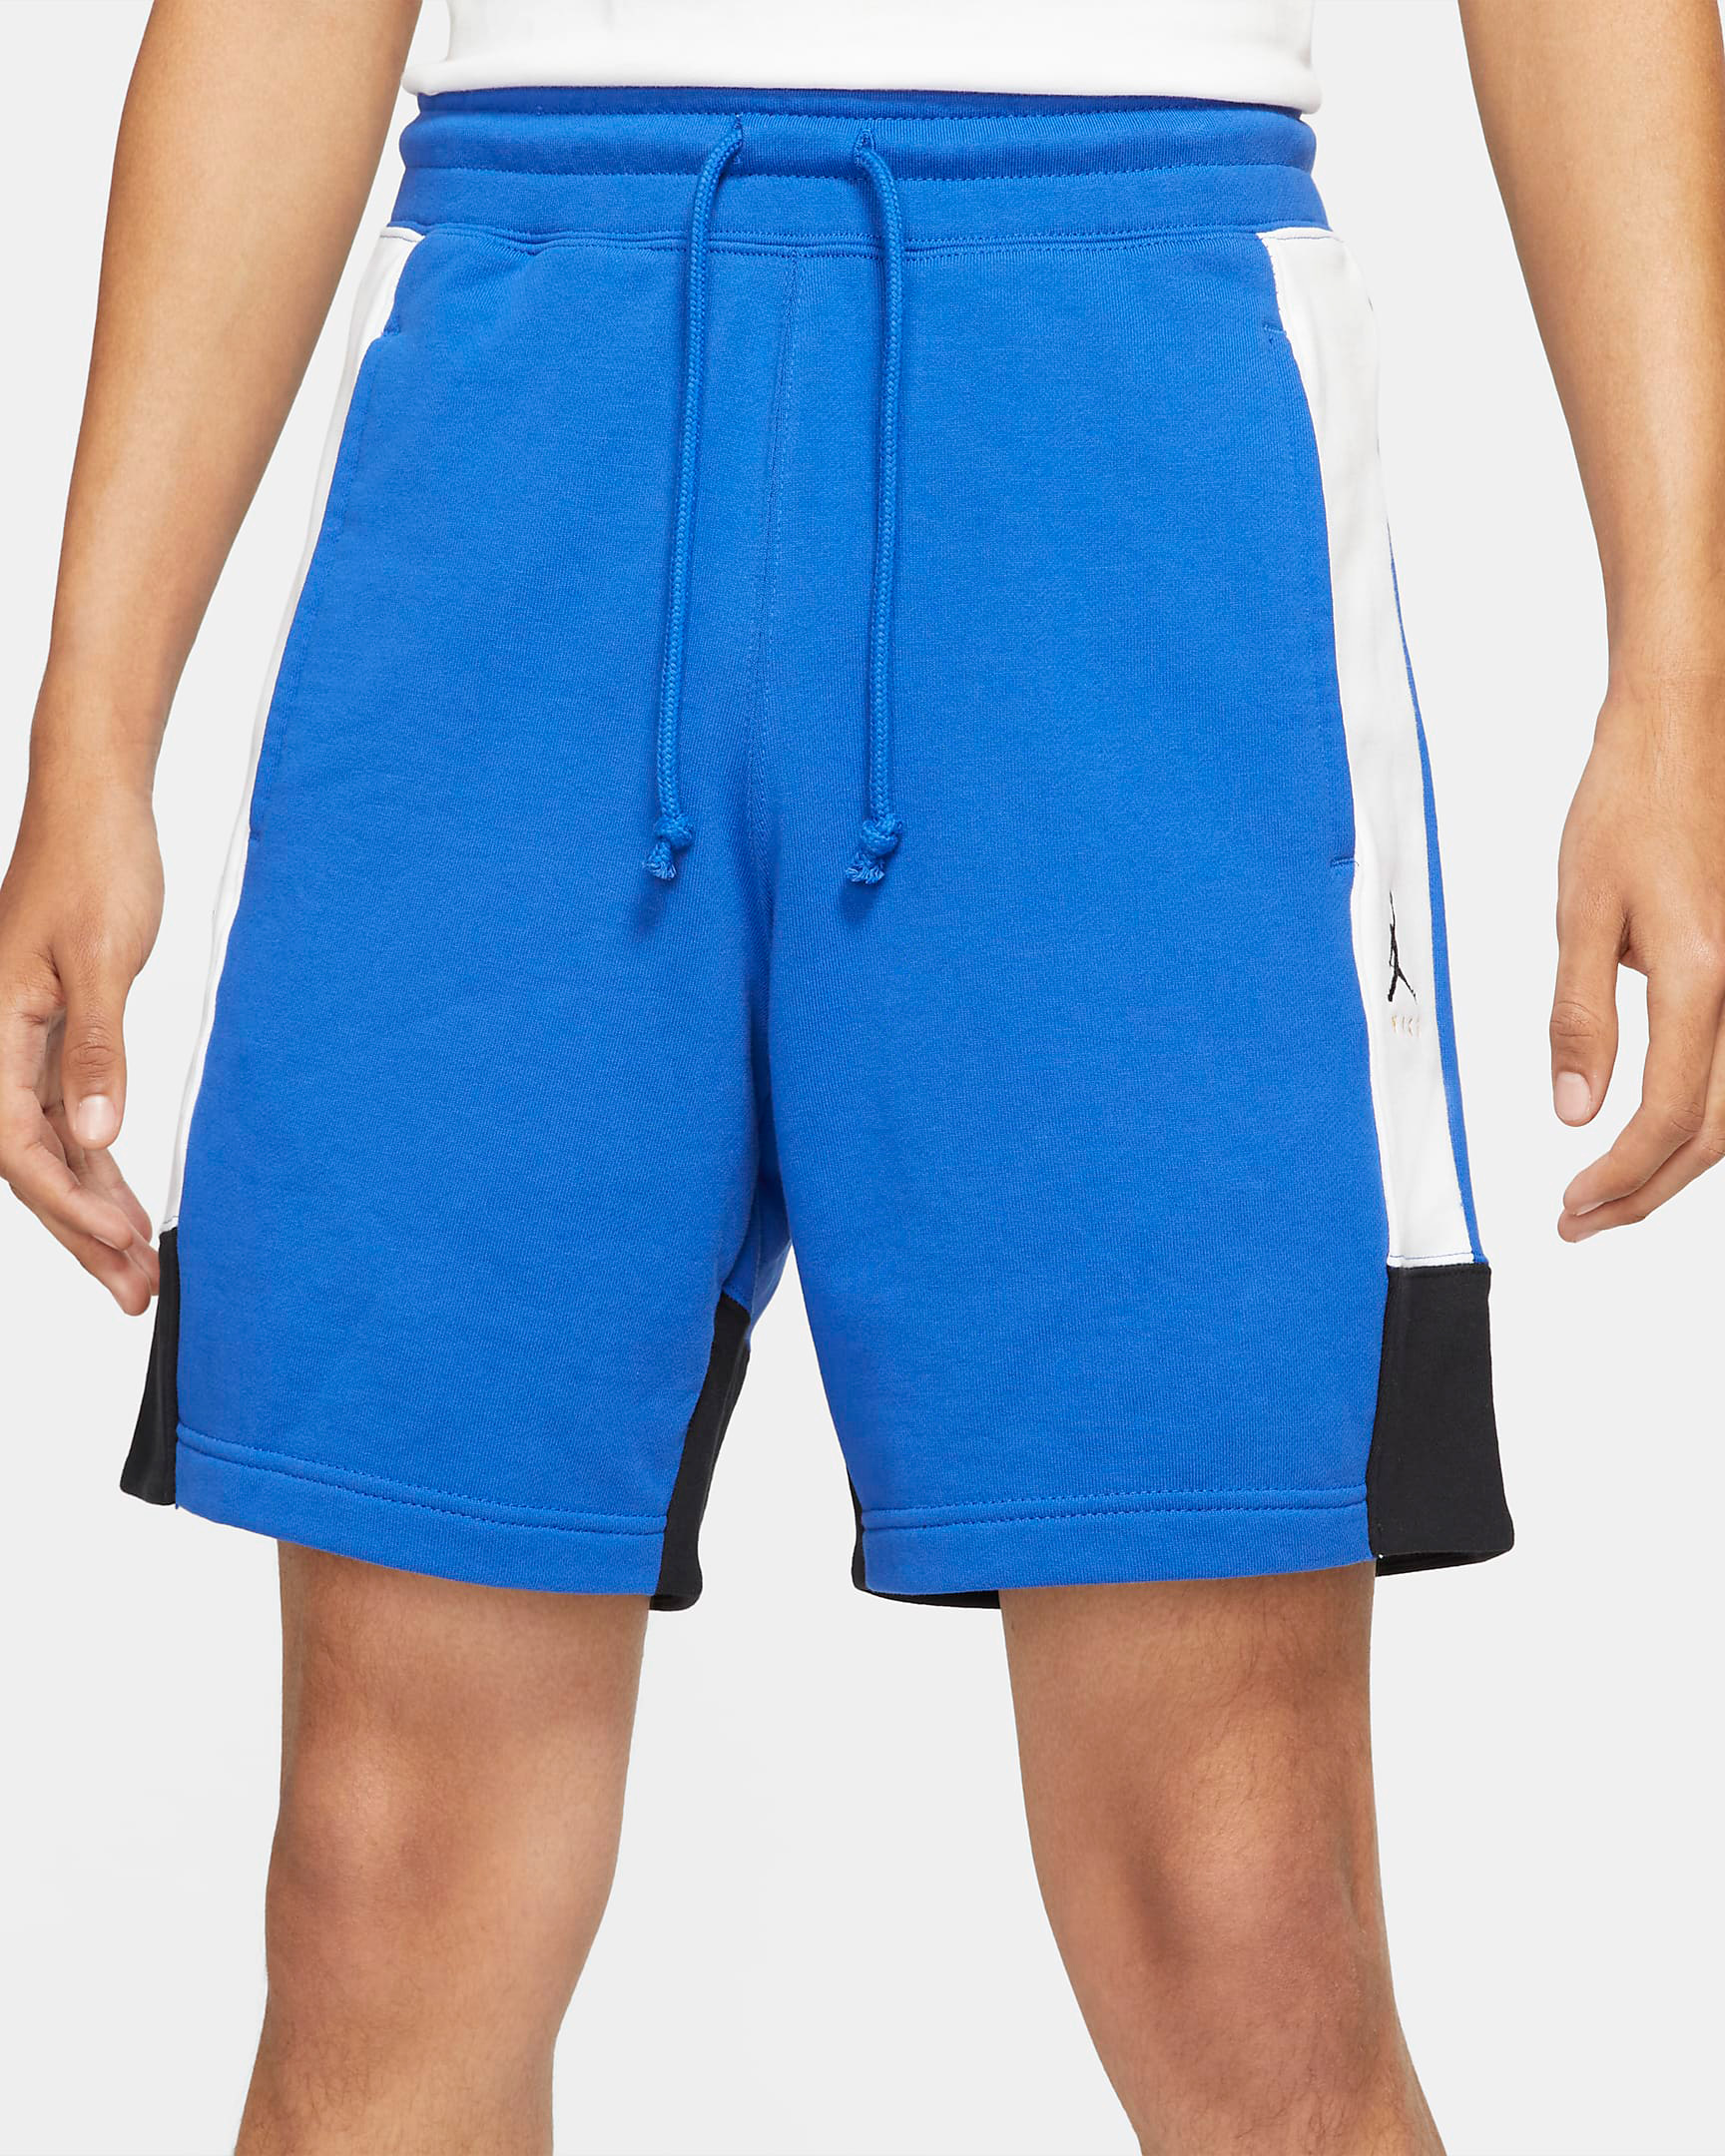 jordan-game-royal-jumpman-fleece-shorts-2